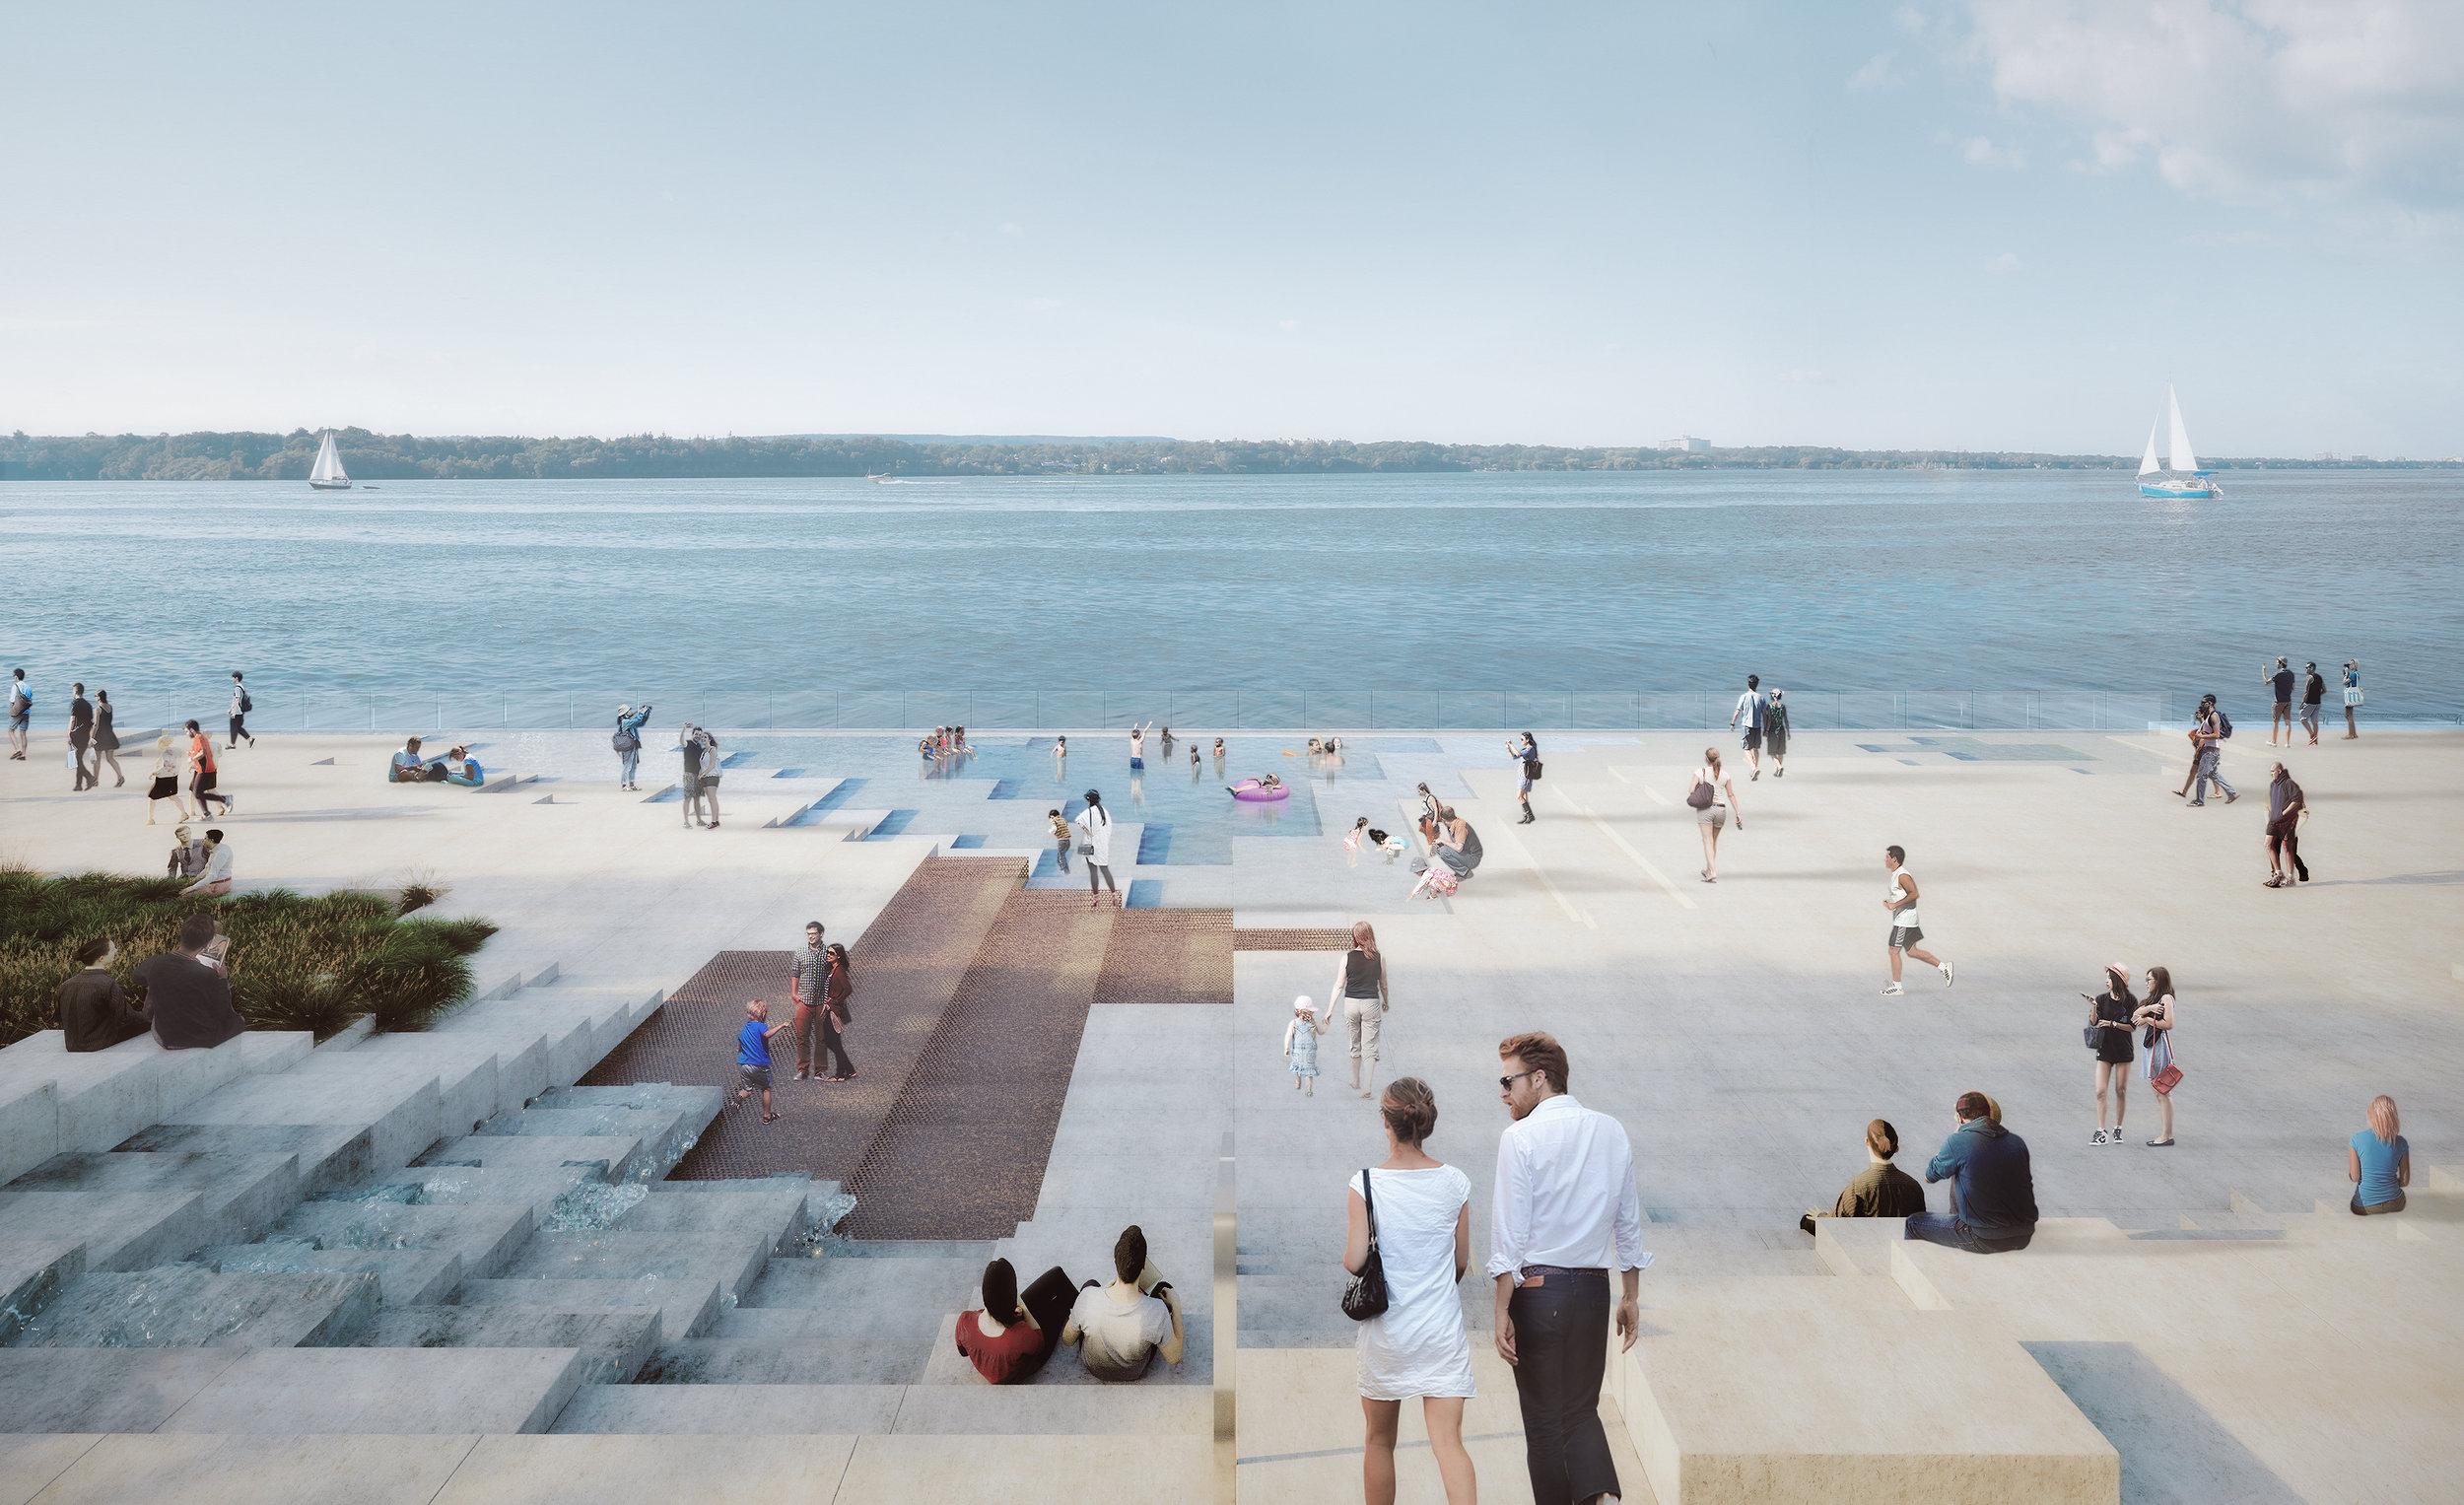 Pier 8 Promenade Park - Pool